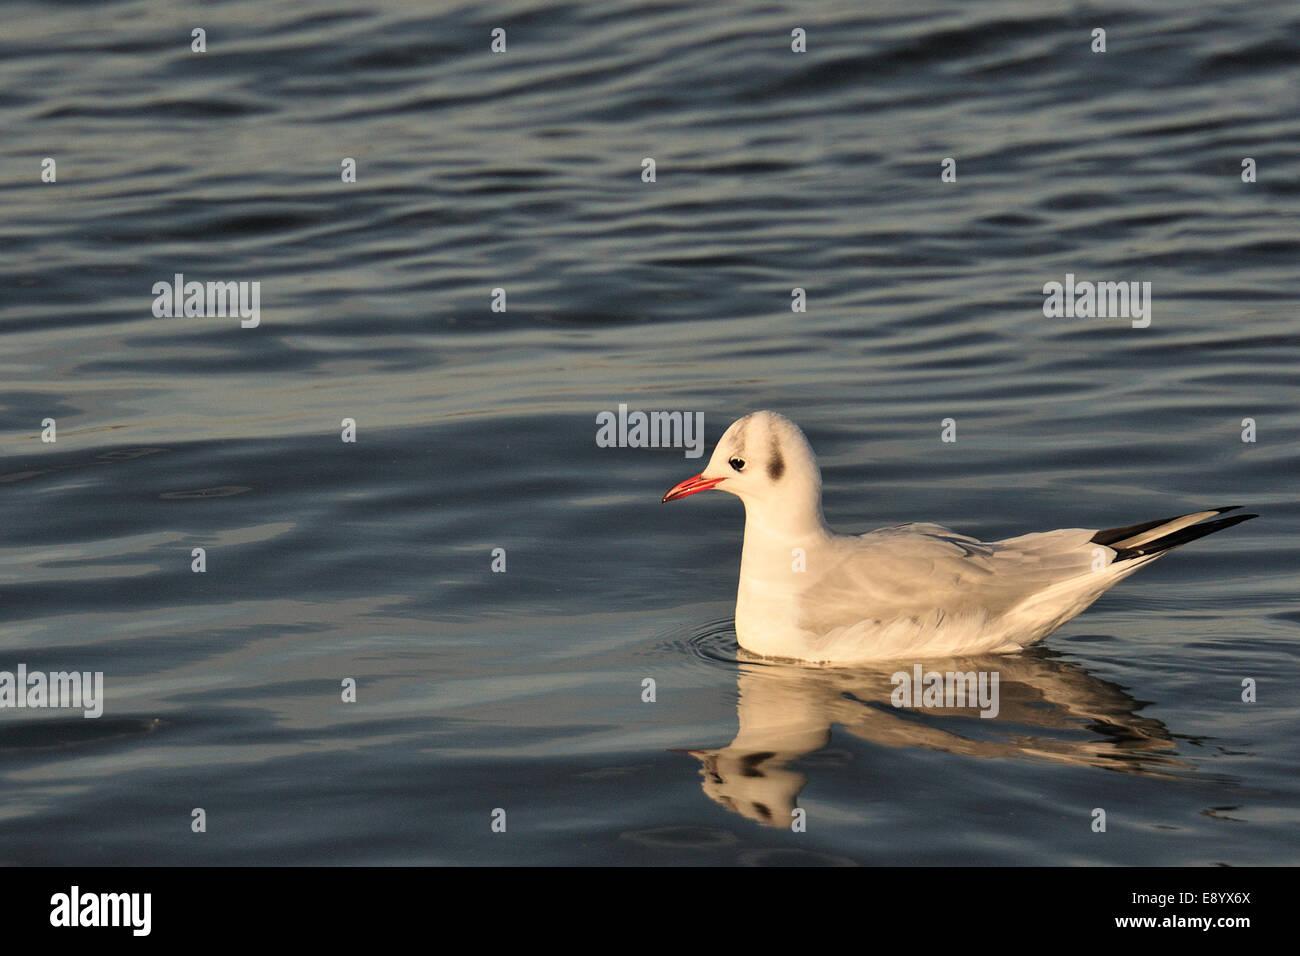 Black-headed gull, Larus ridibundus, Laridae, Dublin,  Ireland, Europe - Stock Image